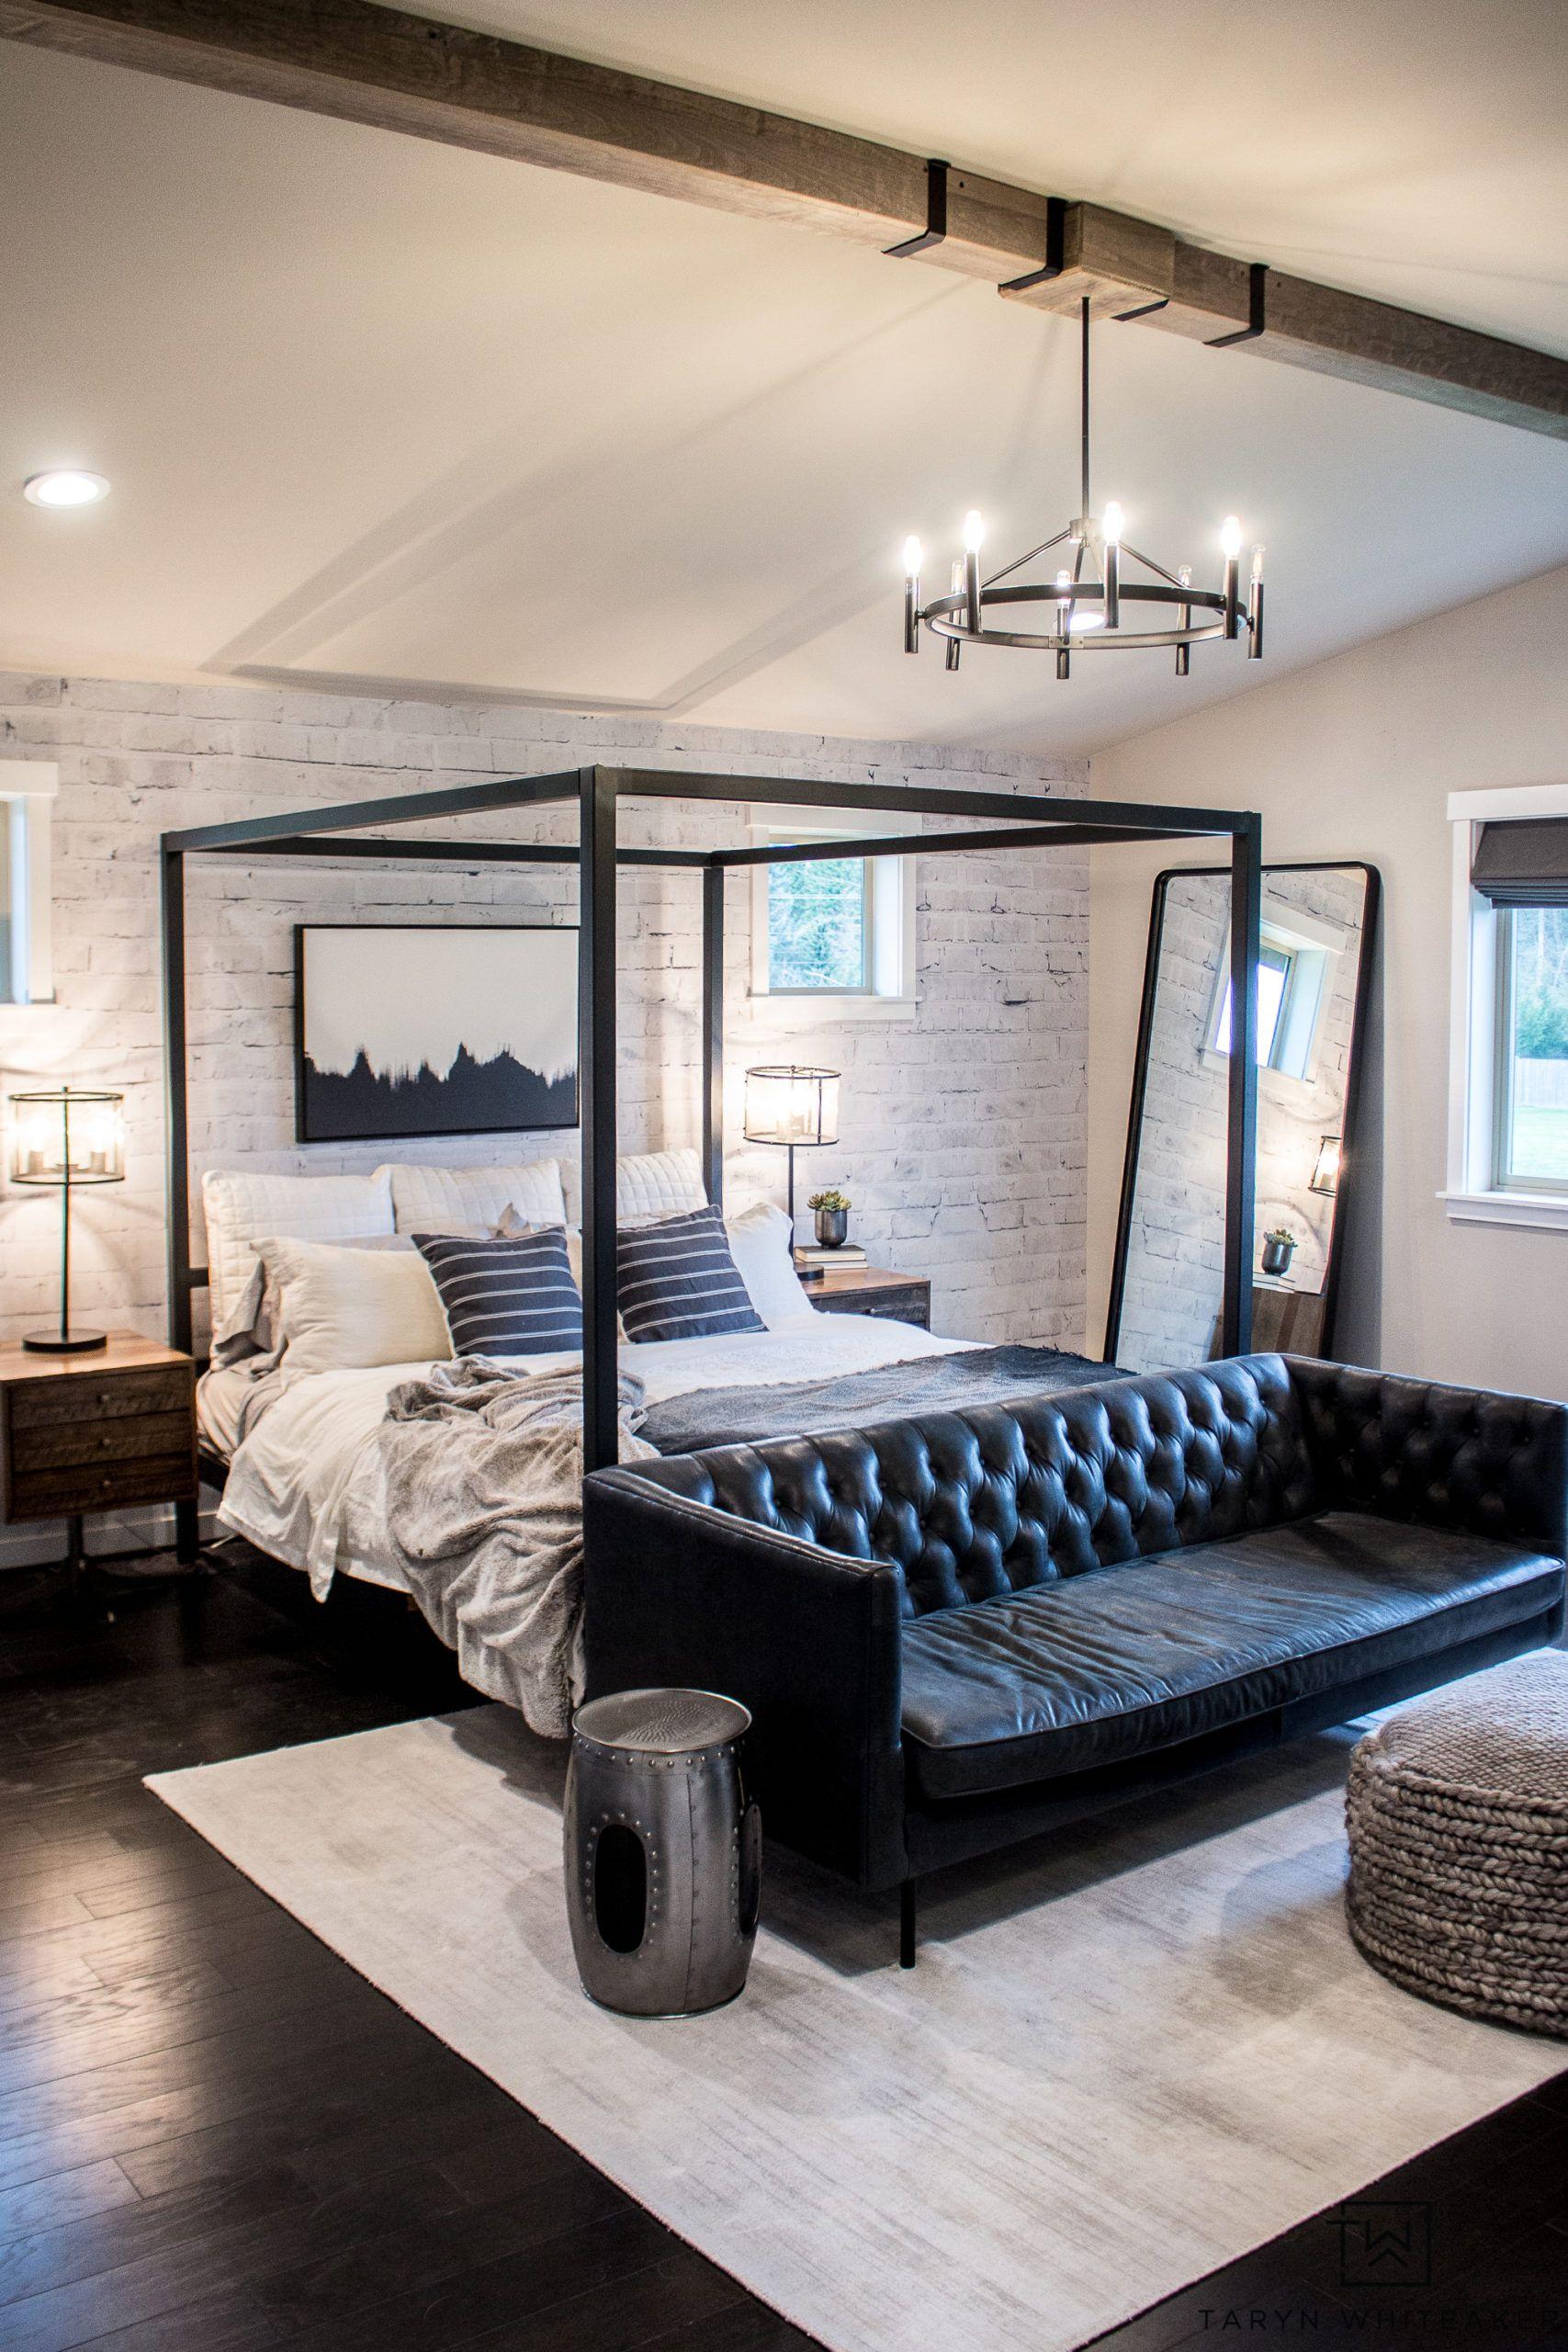 Black And White Master Bedroom Reveal In 2020 White Master